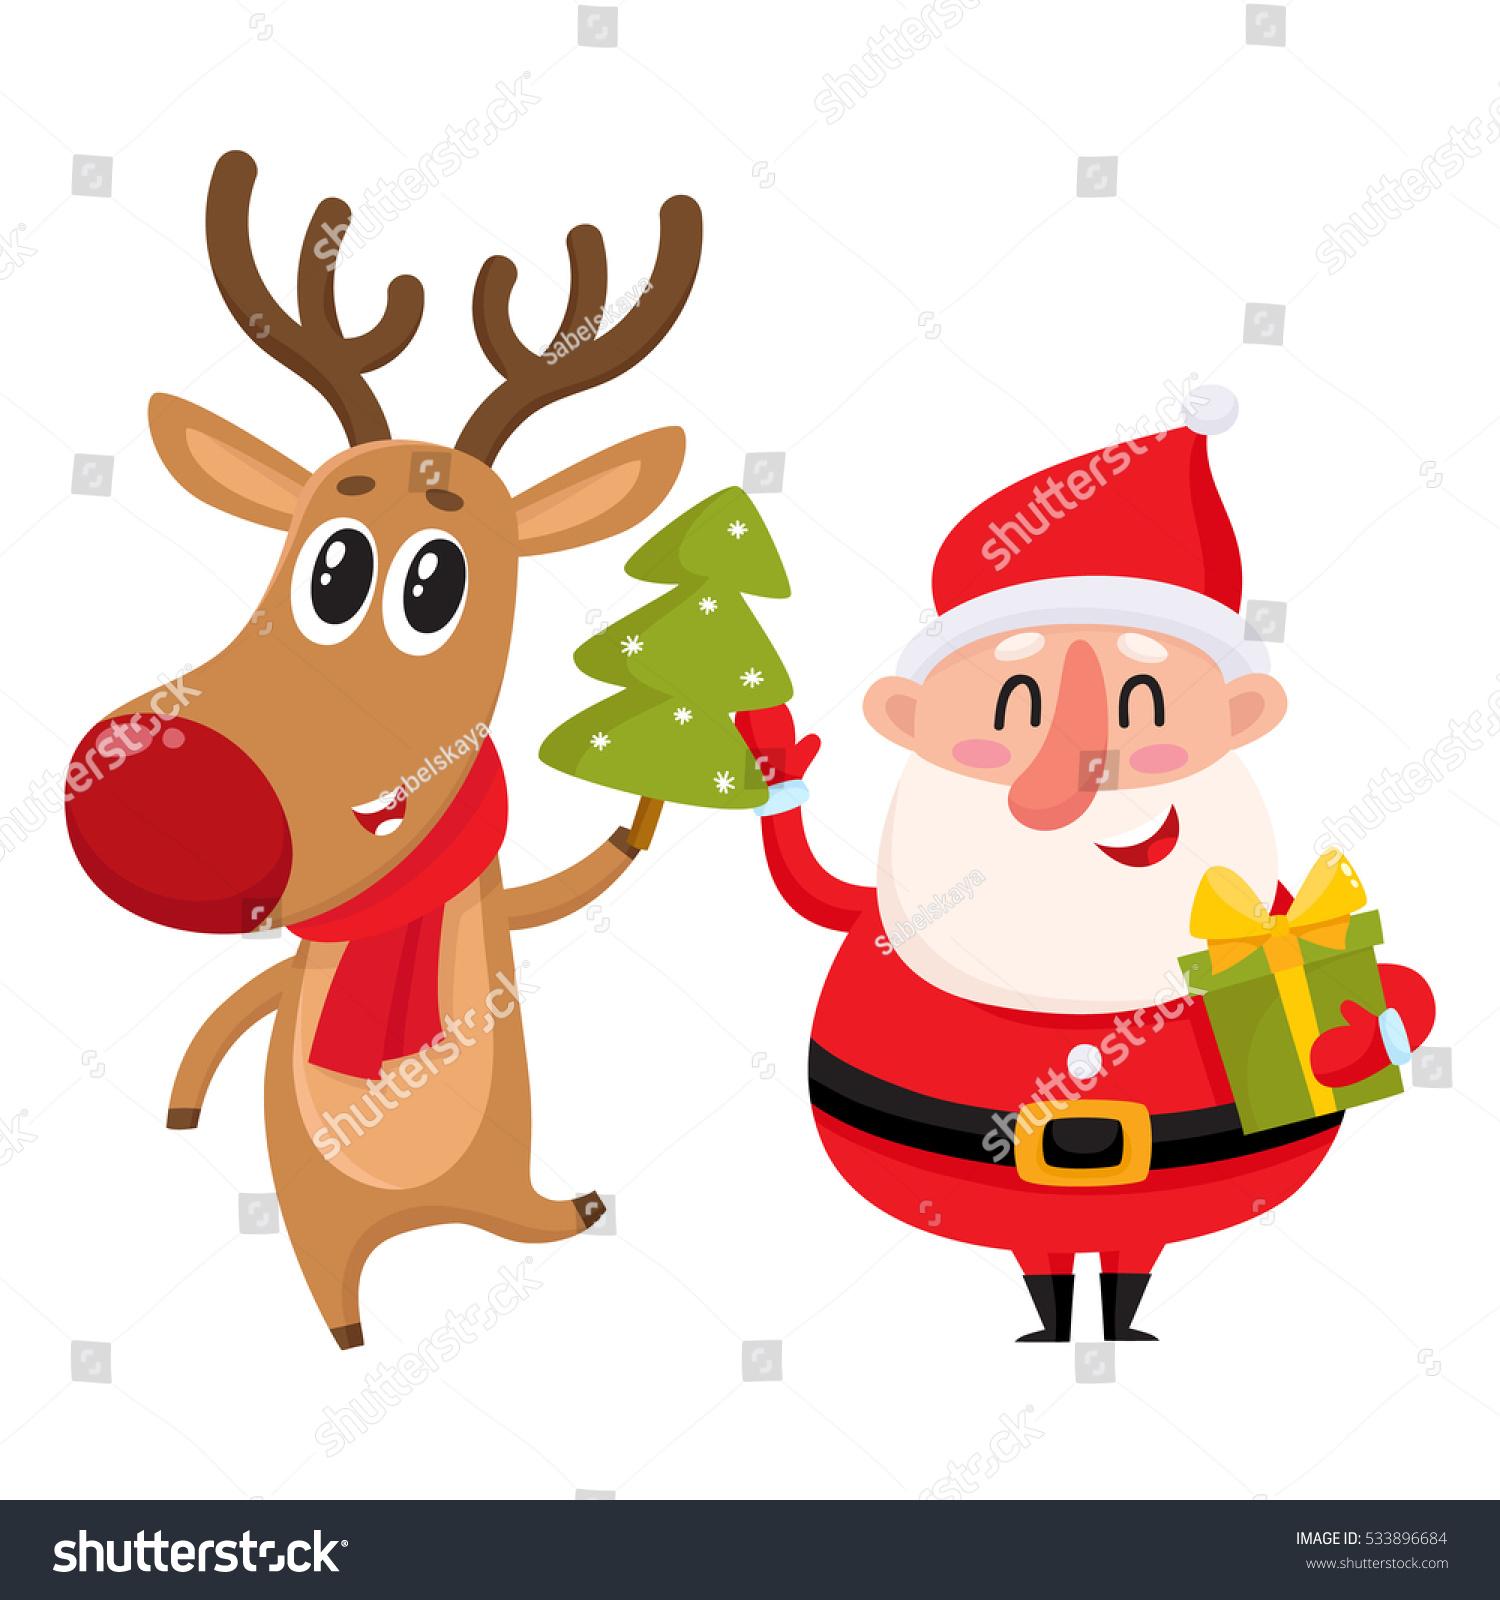 Jolly Santa Smiling Reindeer Stands Christmas Stock Vector